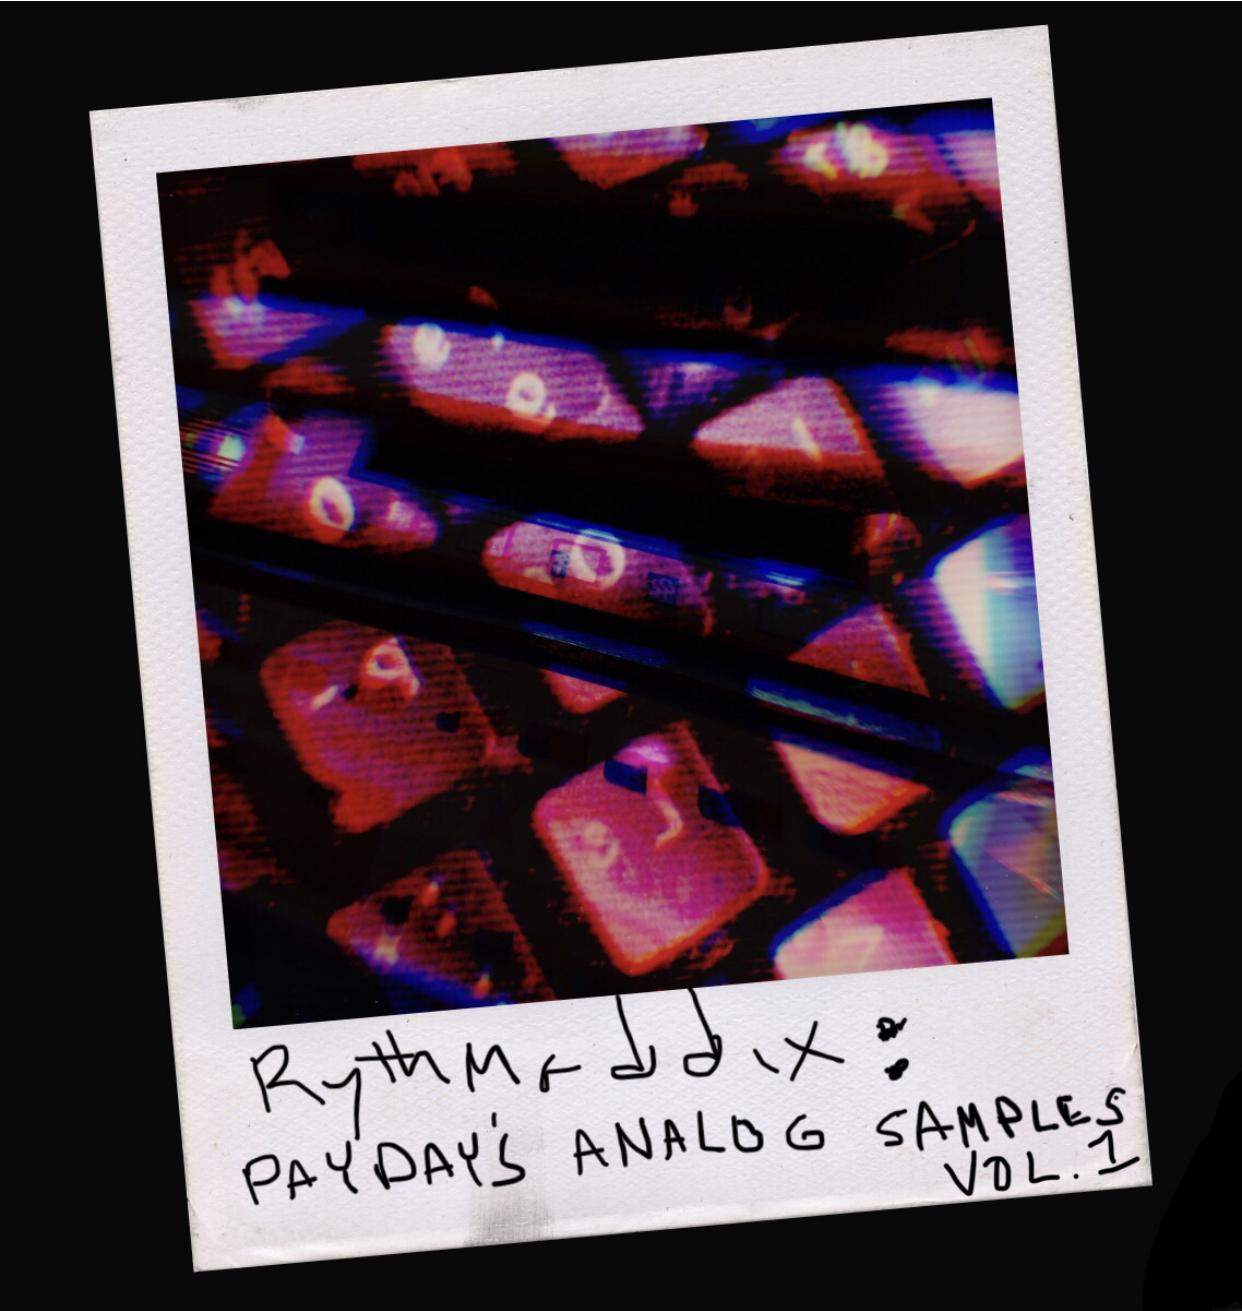 Rhythmaddix Presents DJ Payday's Analog Samples Vol. 1.jpg